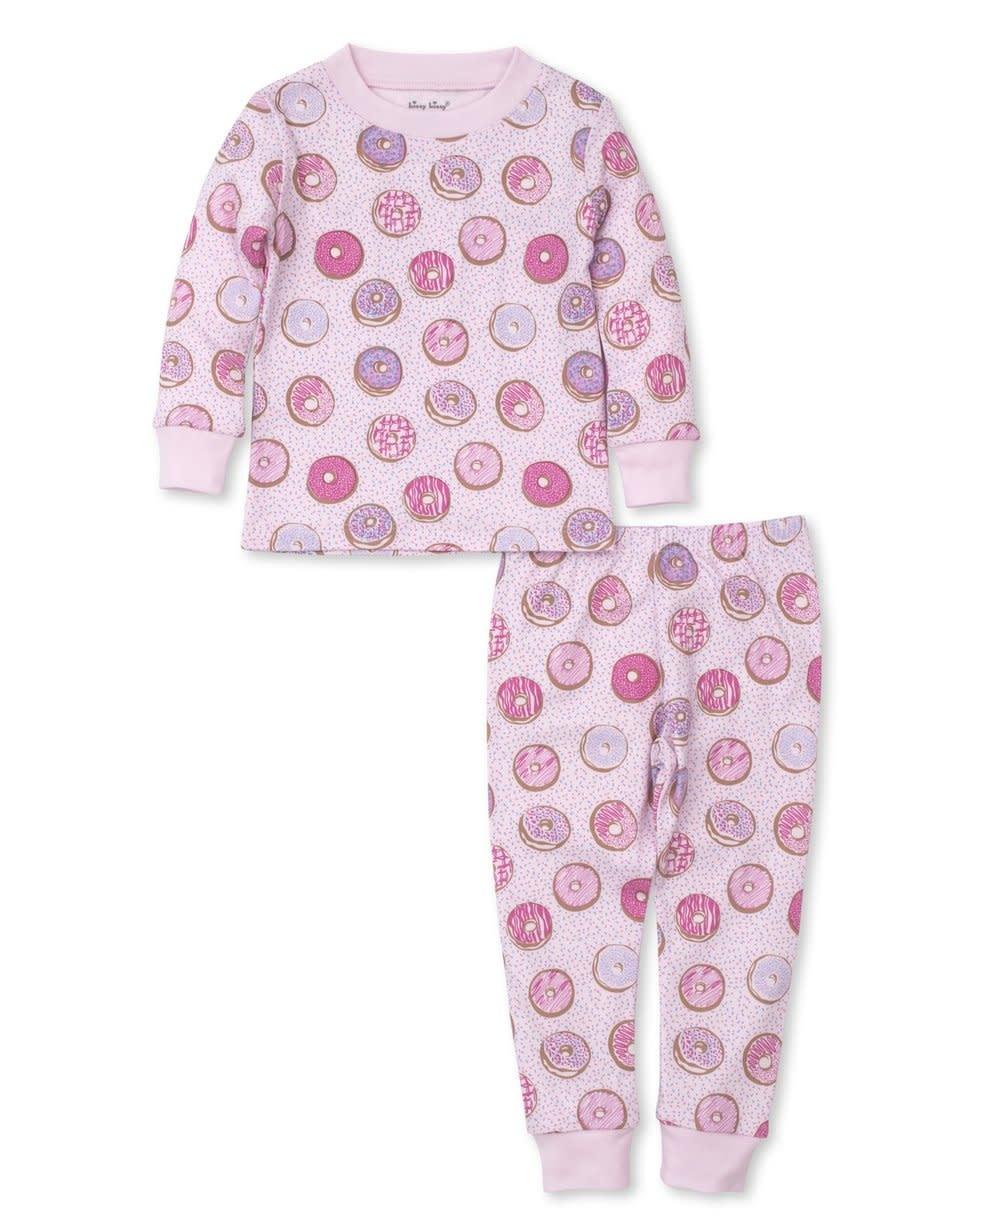 Kissy Kissy Doughnuts Pajamas